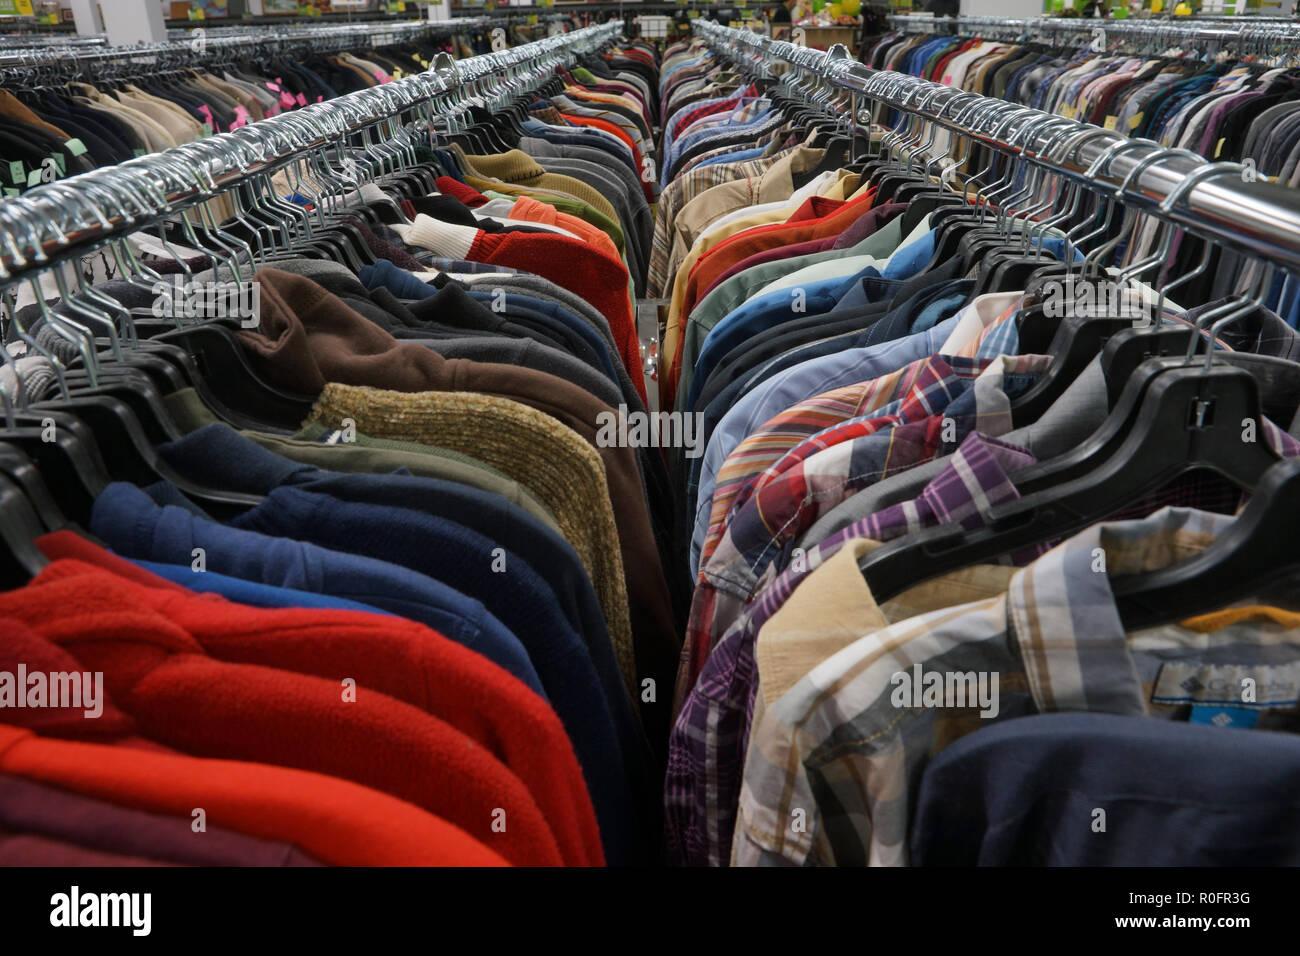 b9a7b6cb294 Racks of used men s clothing in thrift store.Credit Mario Beauregard Alamy  Live News